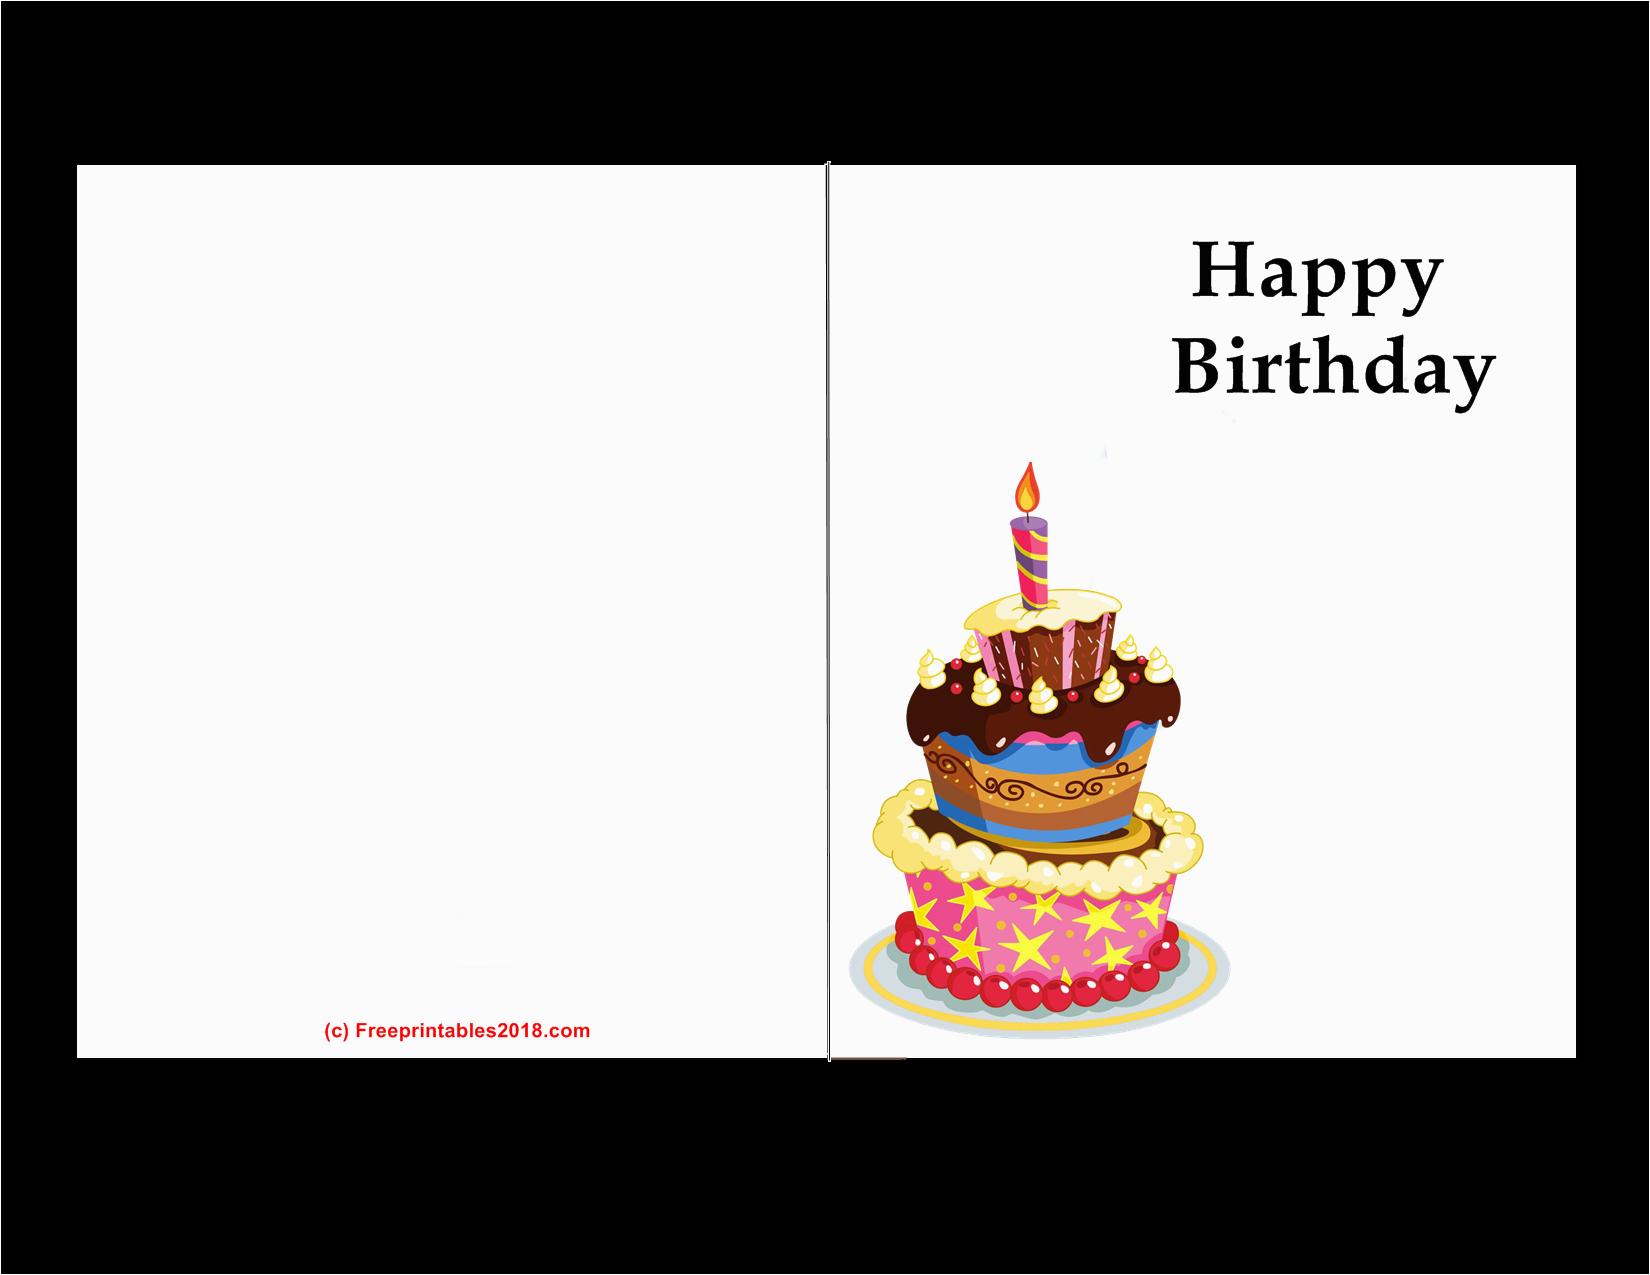 Free Printable Online Birthday Cards Printables 2018